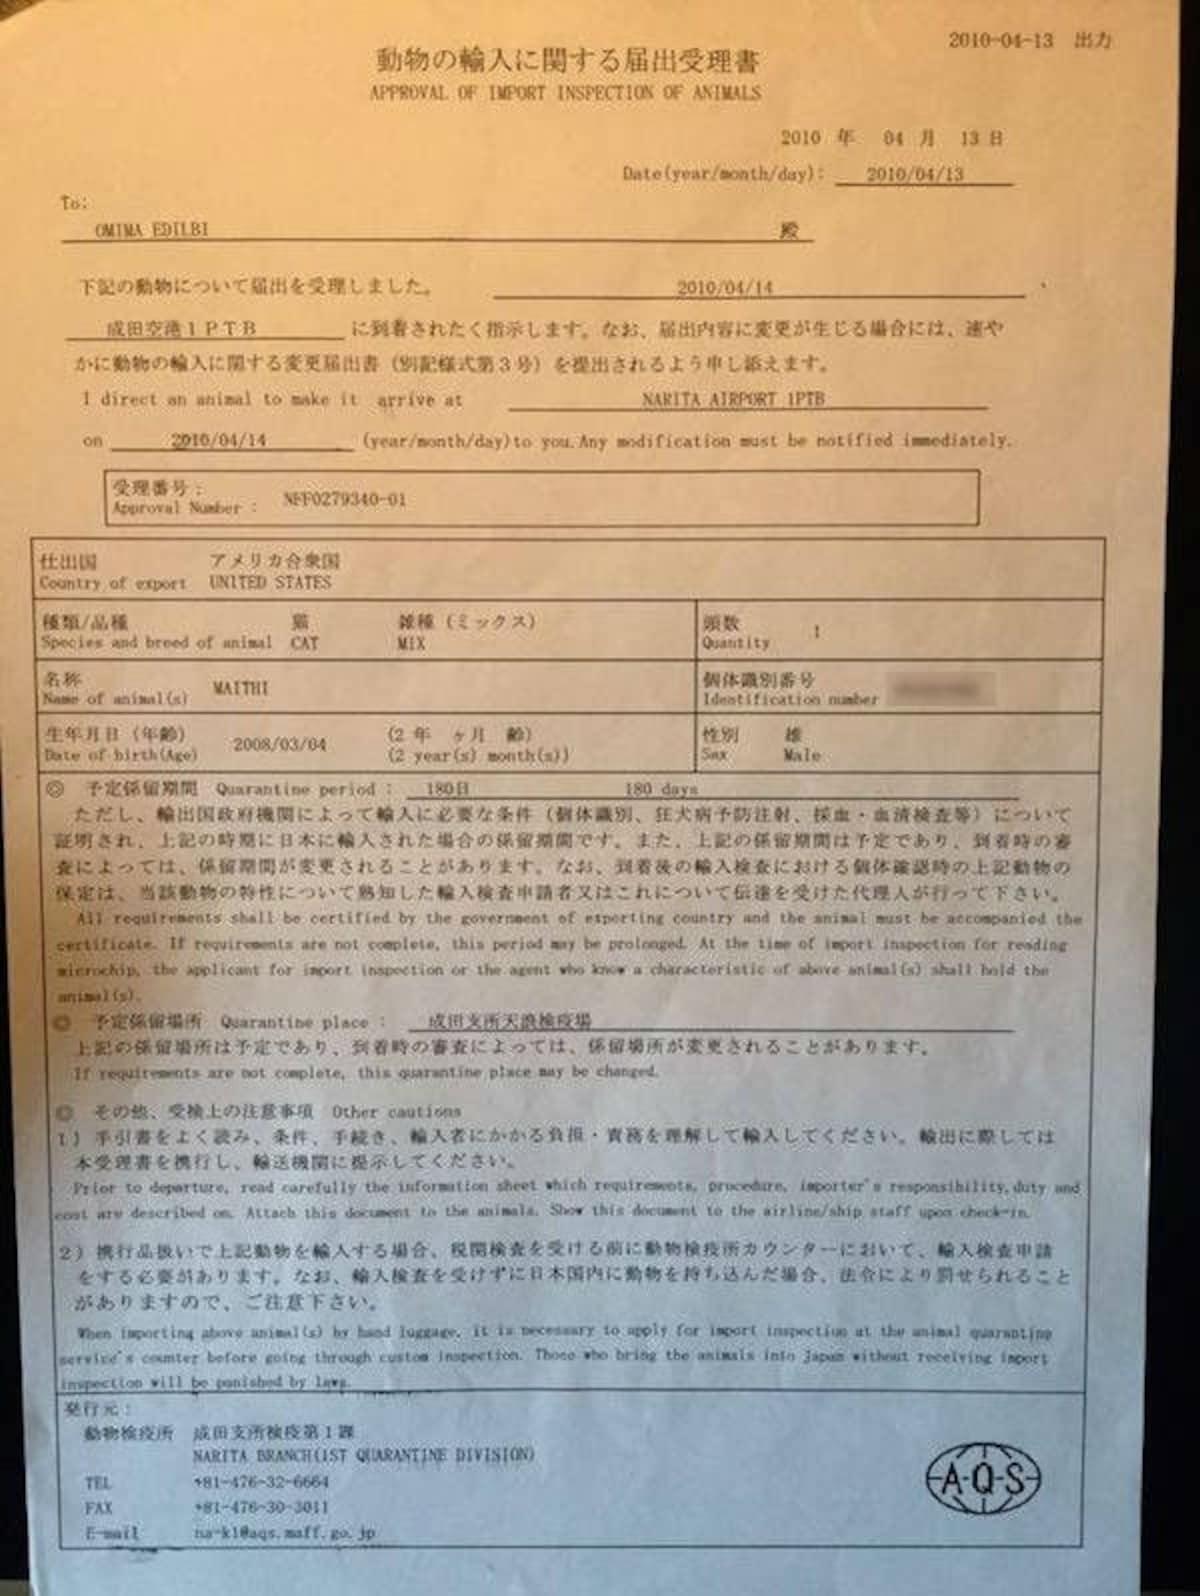 2. Import Permits